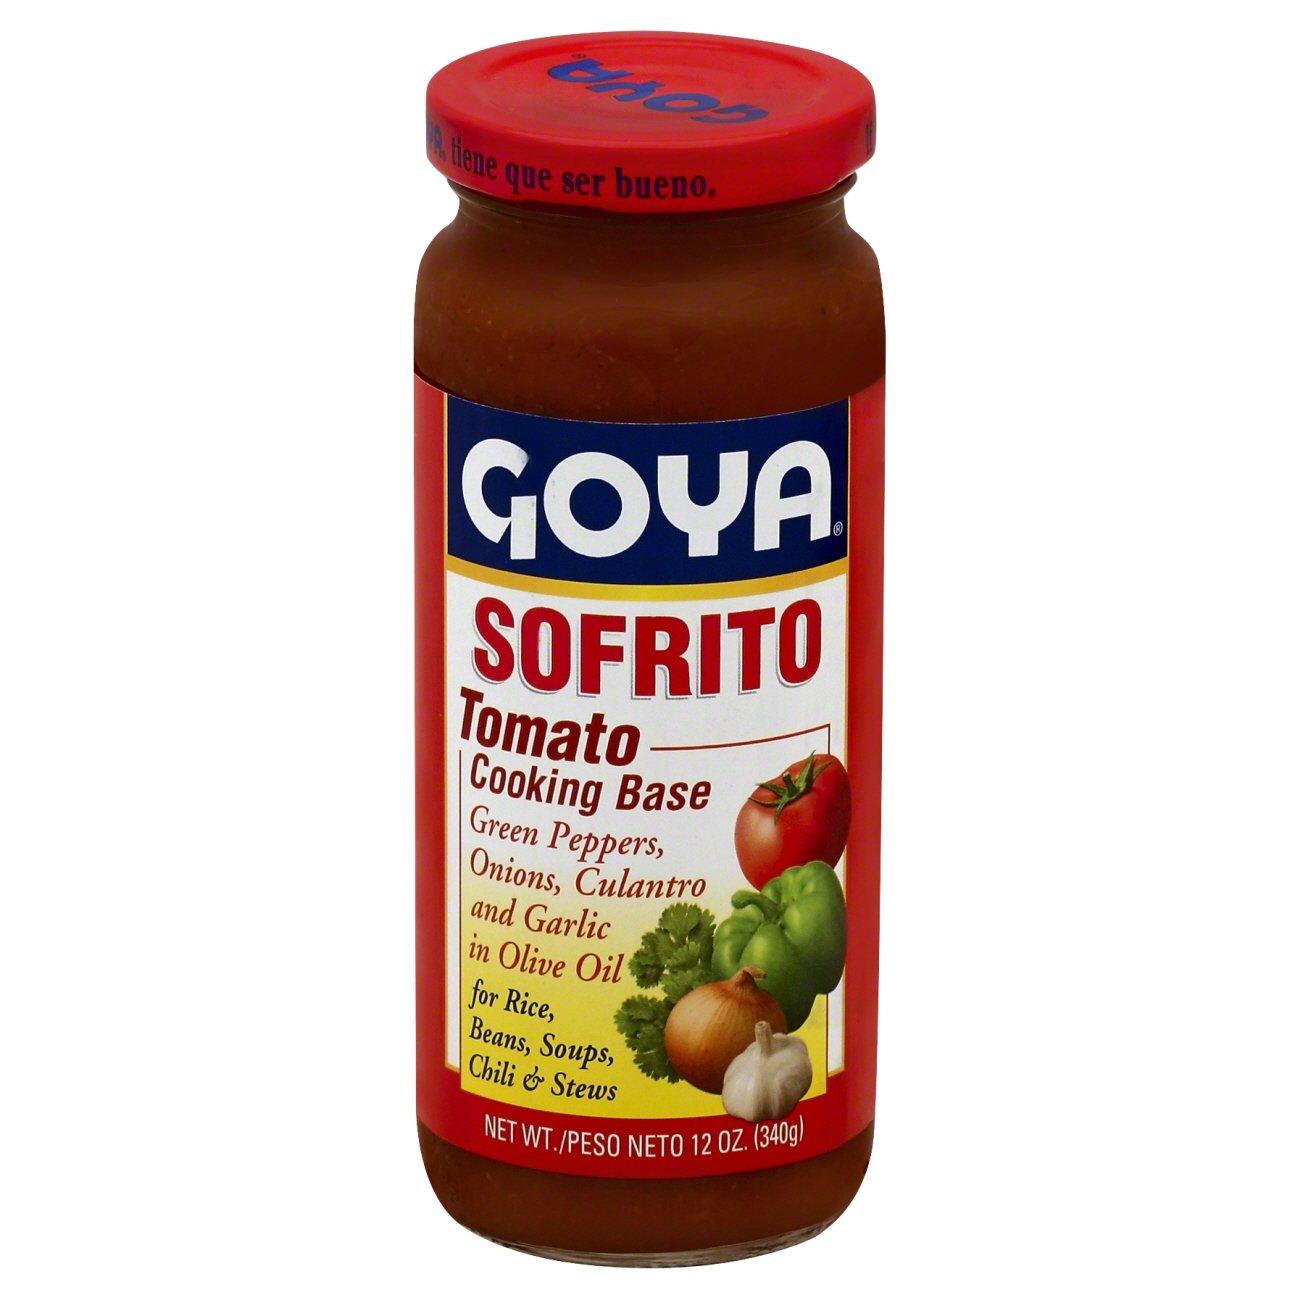 Goya Sofrito Shop Goya Sofrito Shop Goya Sofrito Shop Goya